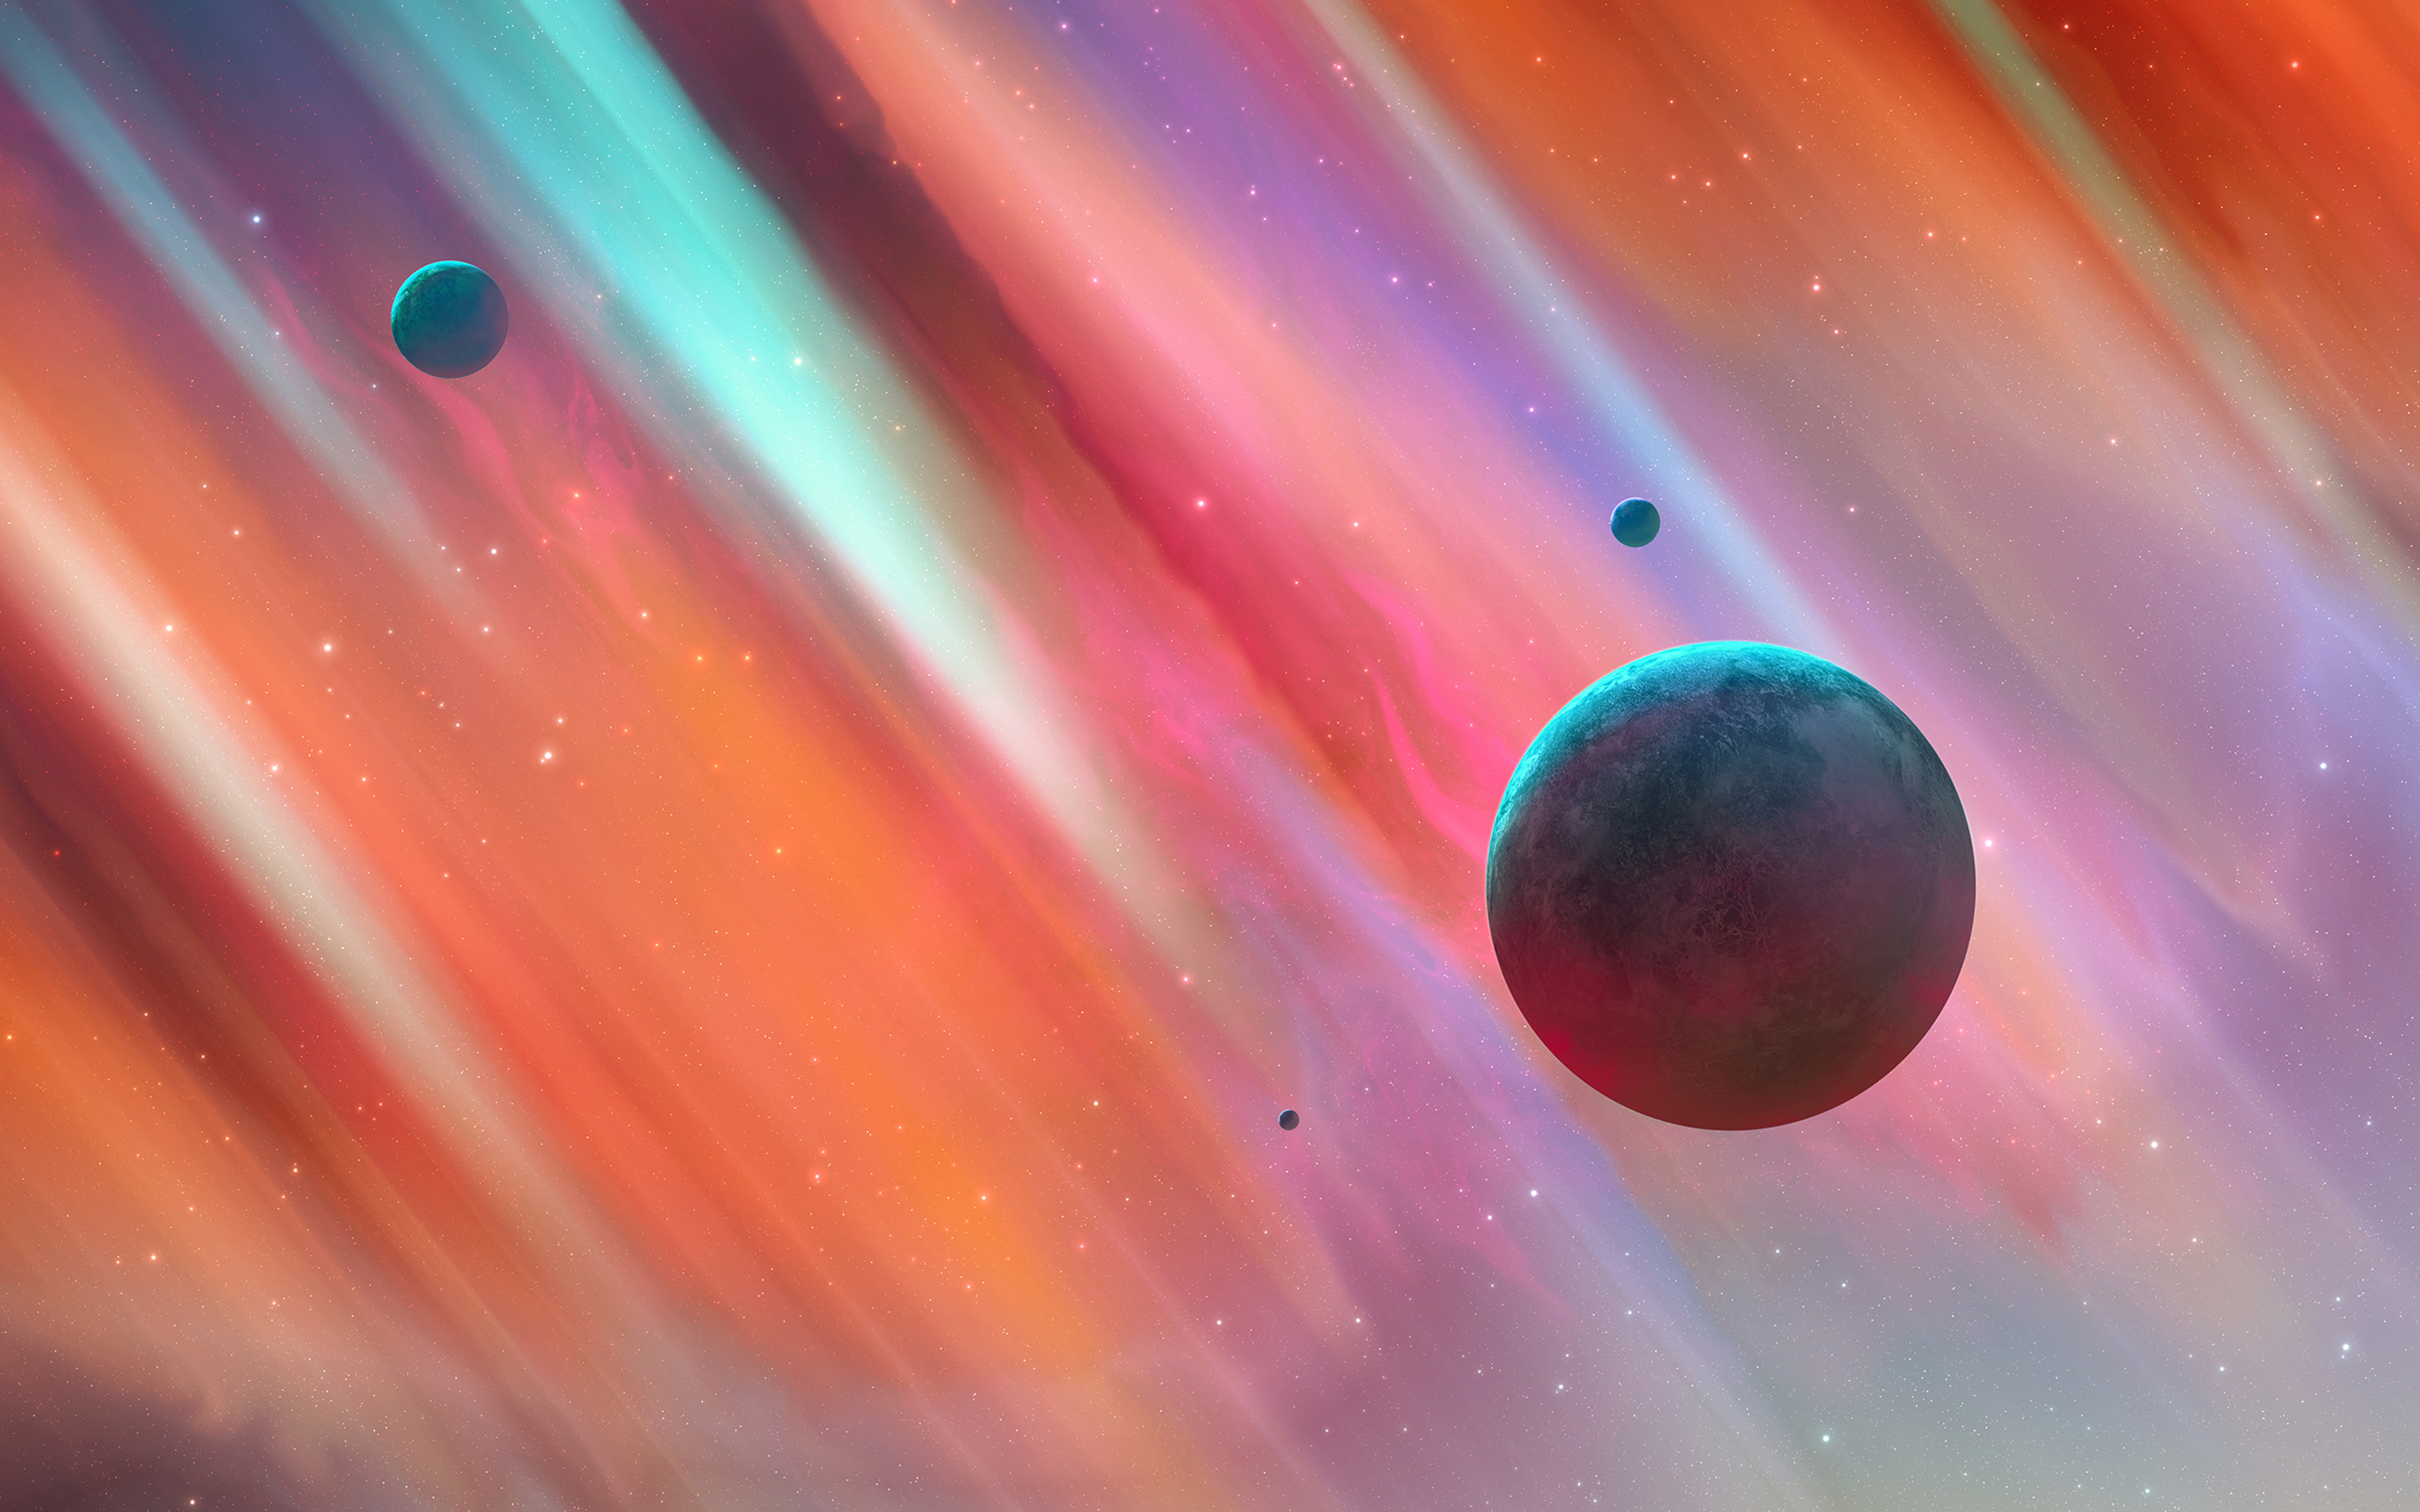 Fondos de pantalla Universo de colores